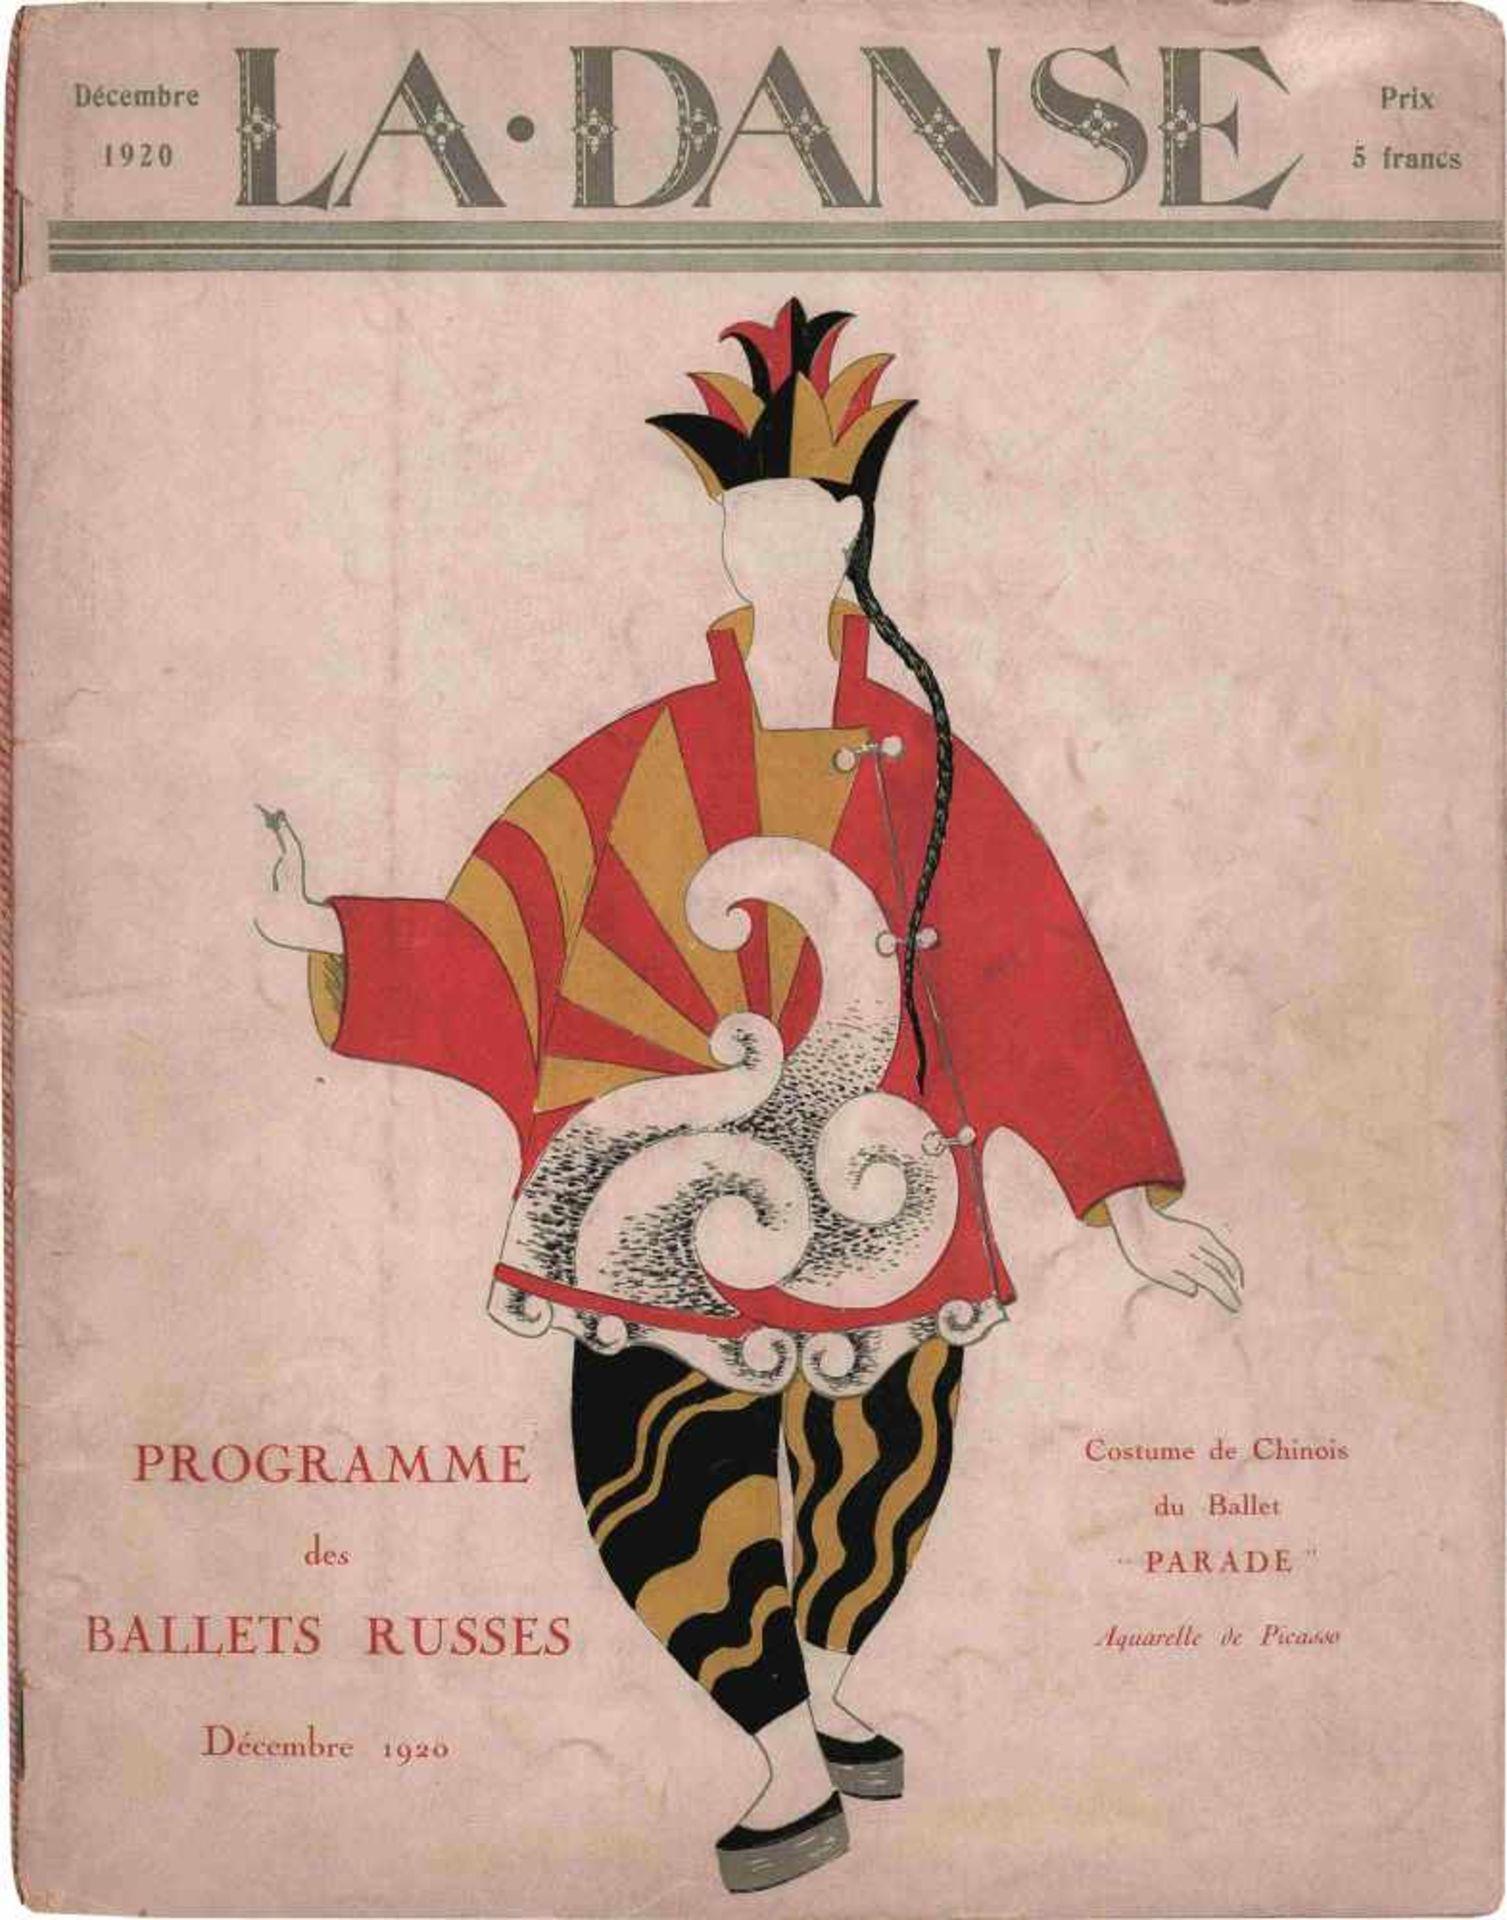 [BALLETS RUSSES, BENOIS, HUGO, DIAGHILEW, BAKST, PICASSO] Programmheft der Ballets Russes im Théâtre